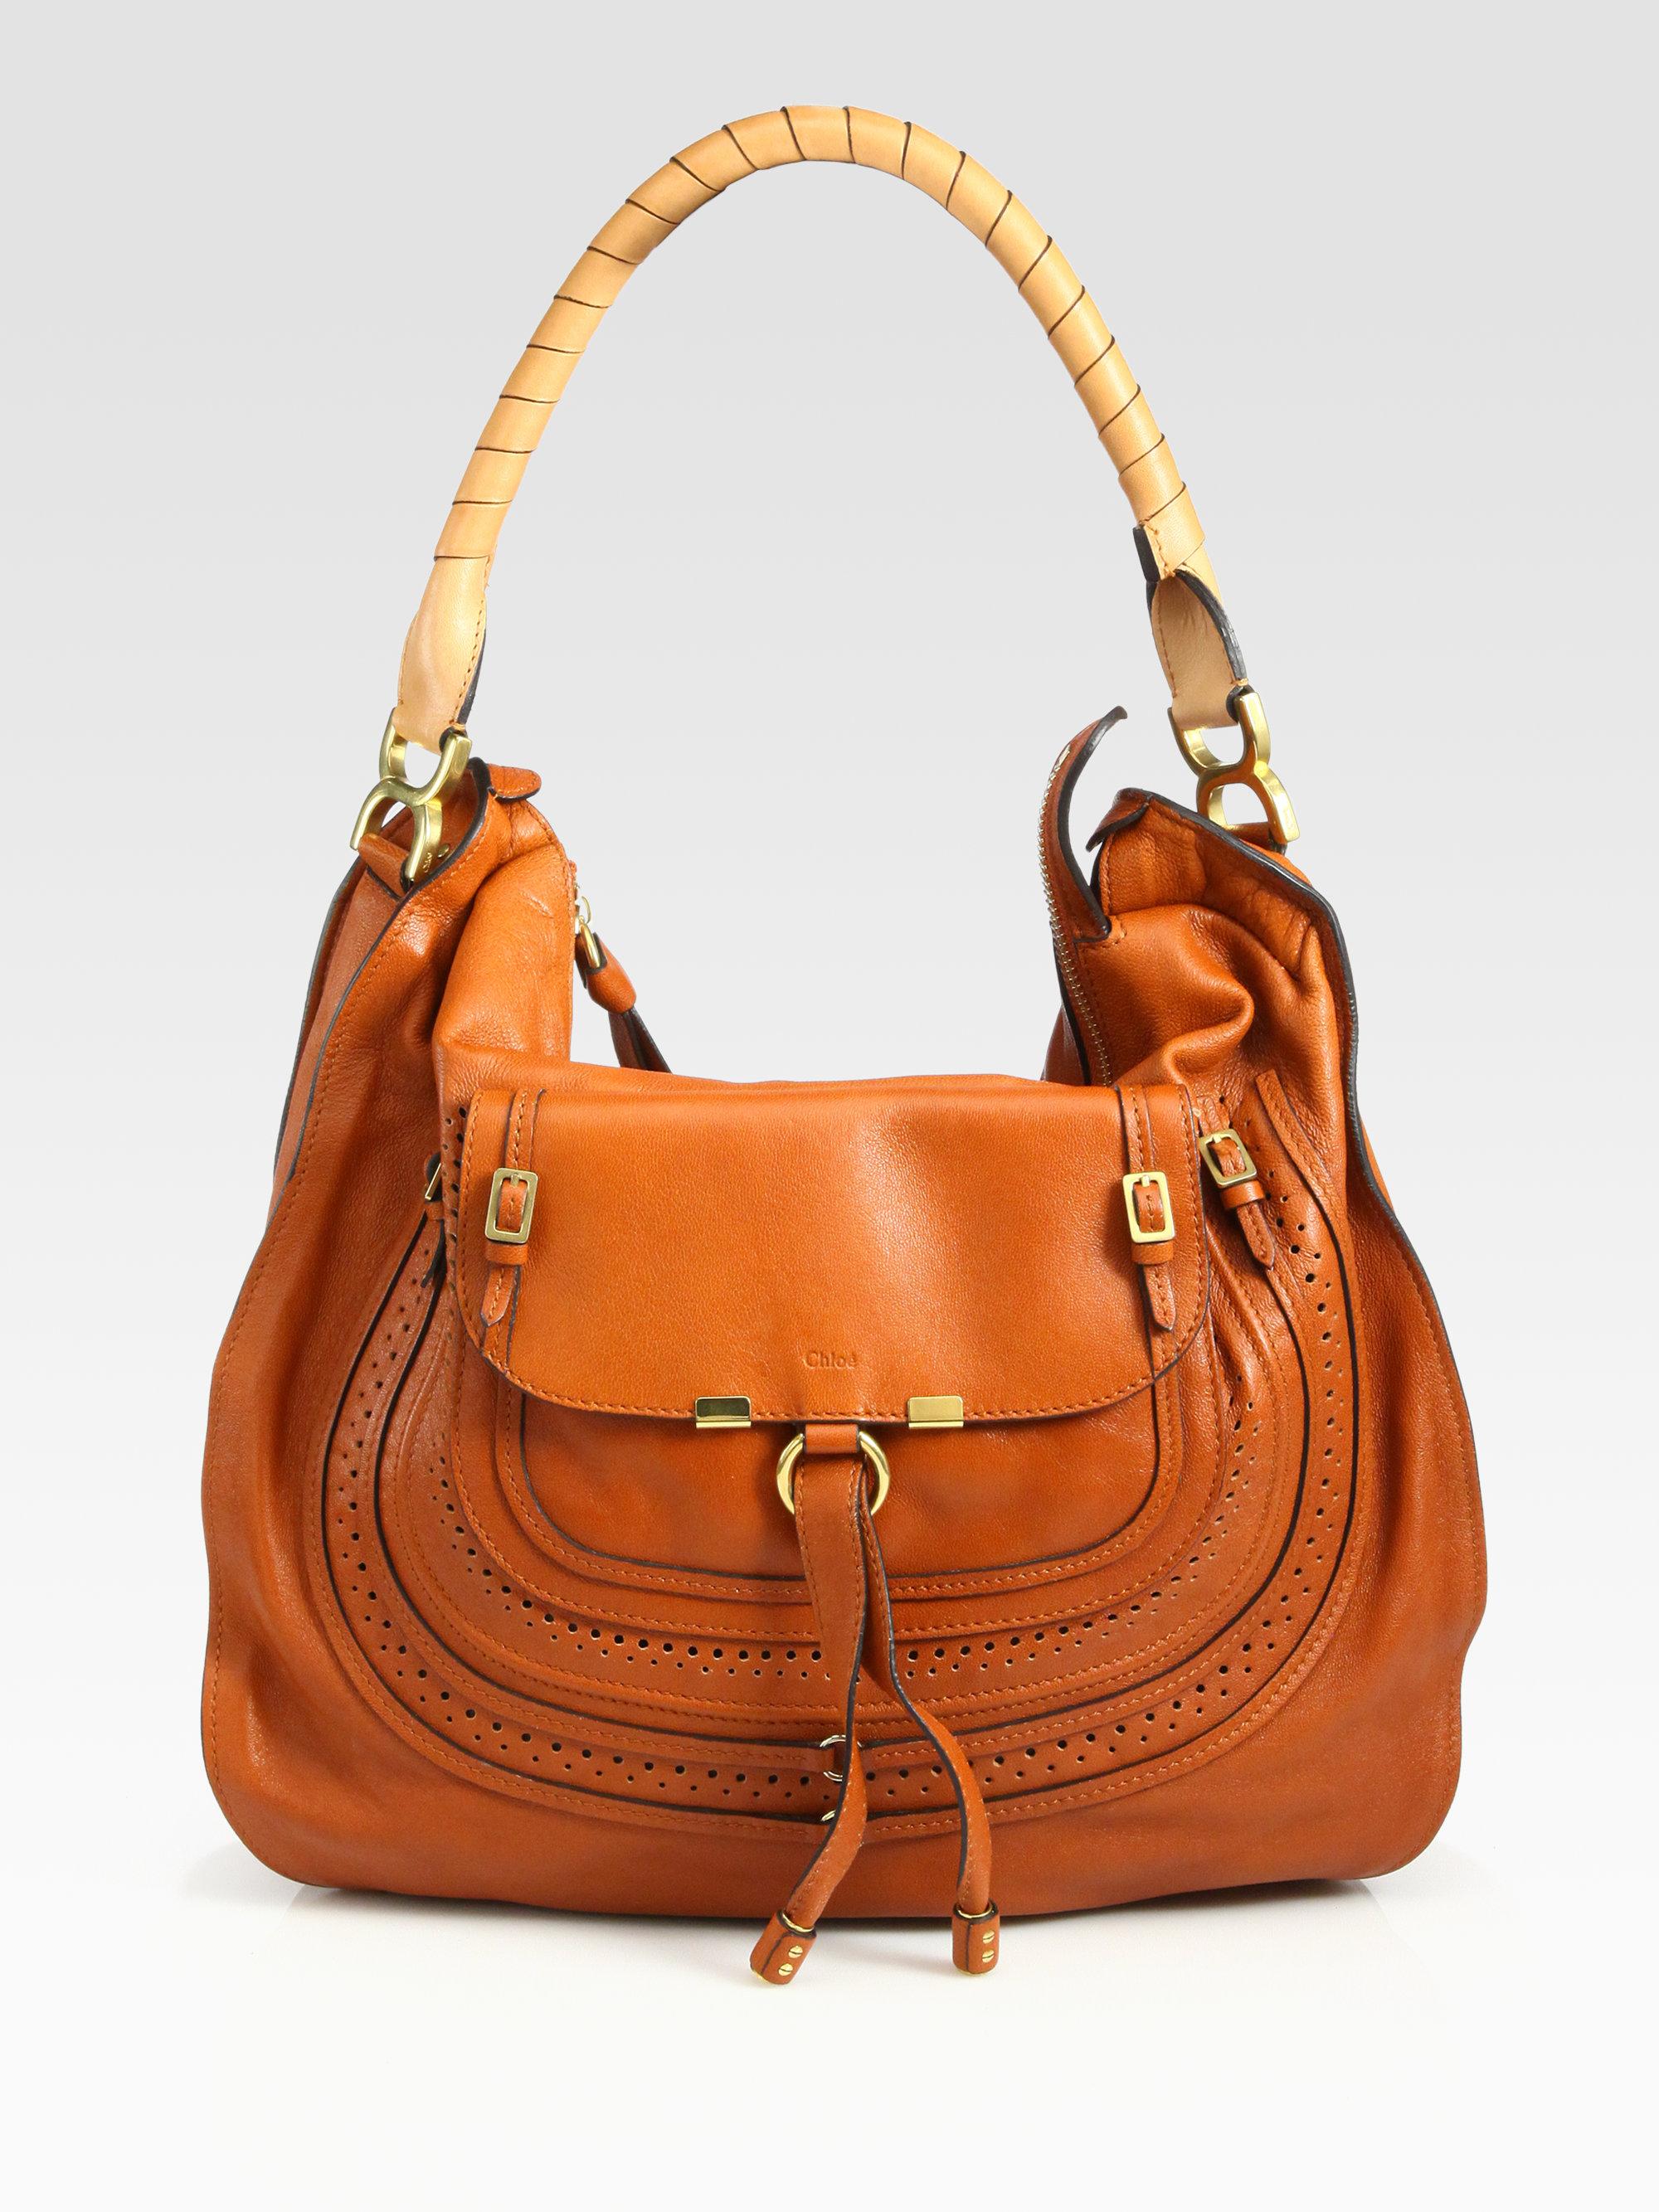 Chloé Marcie Animation Hobo Bag in Orange | Lyst